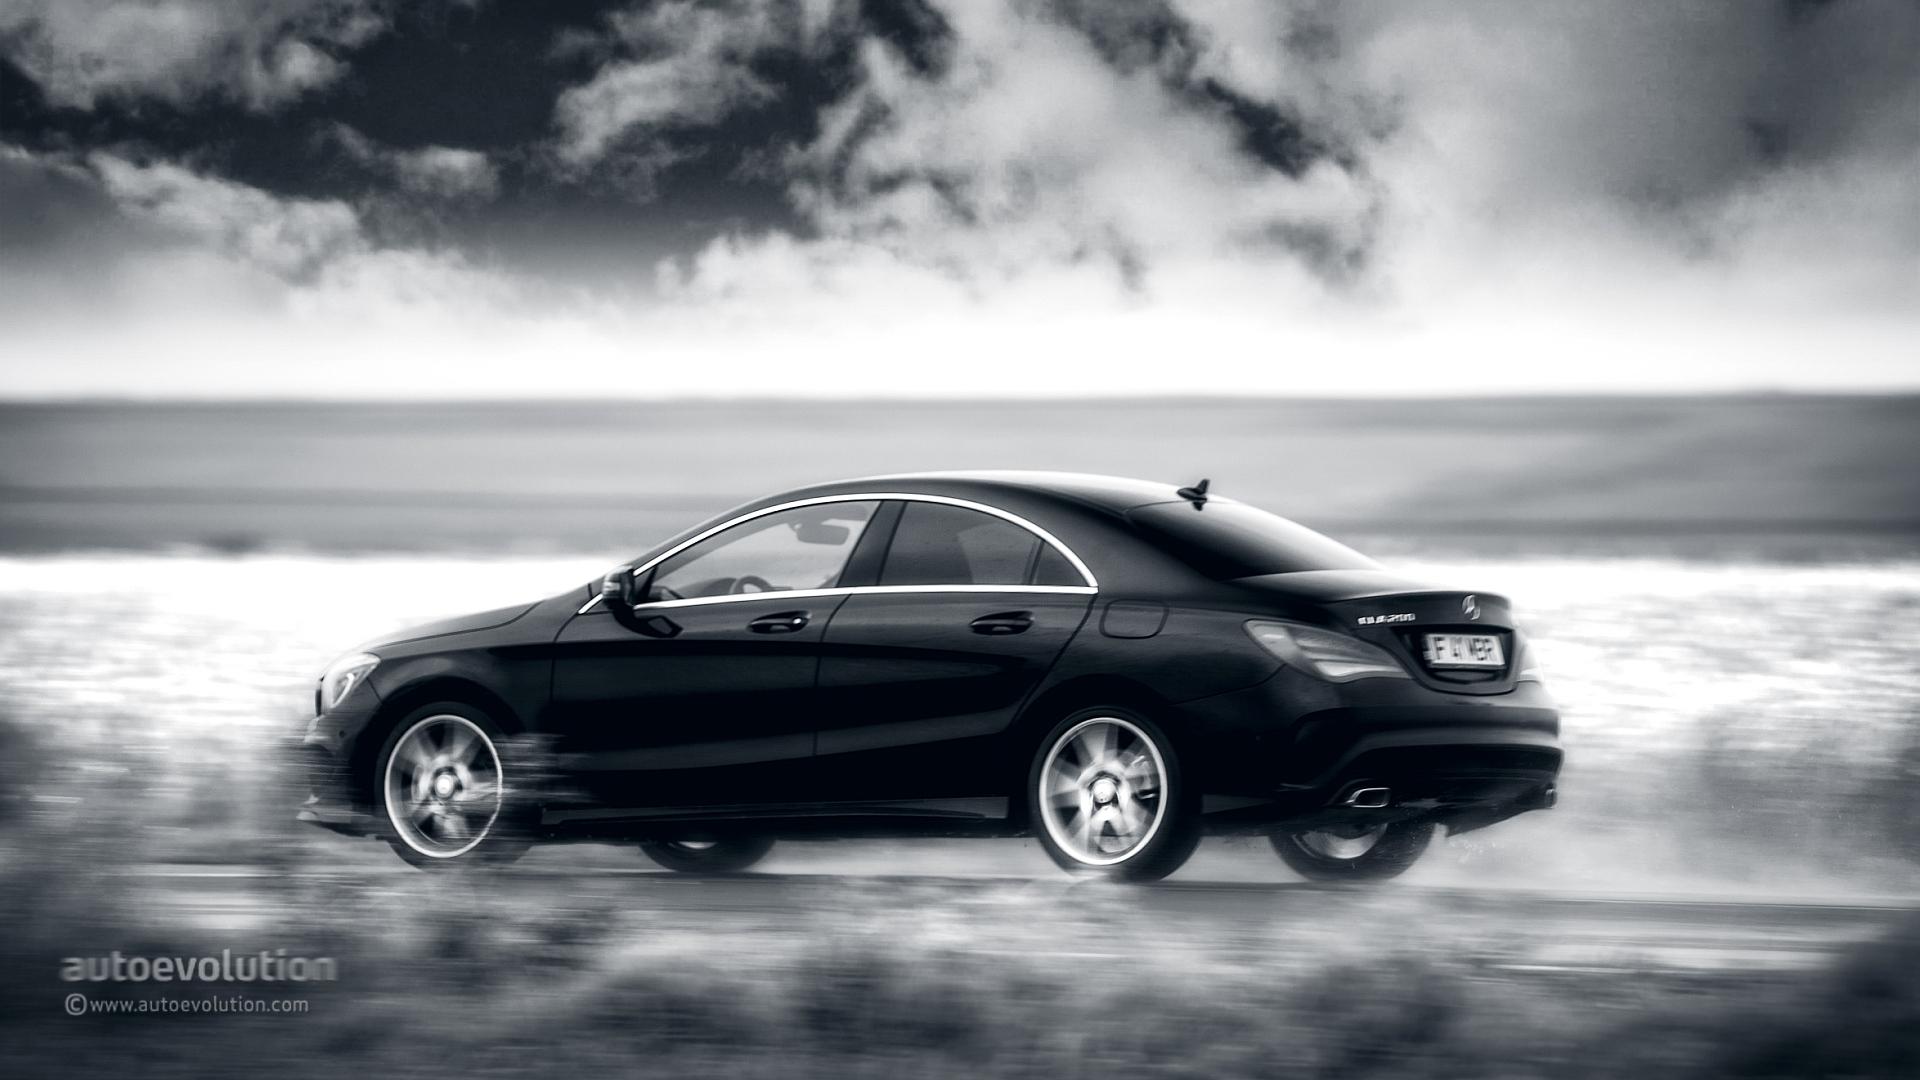 Mercedes Benz Cla Hd Wallpapers Autoevolution